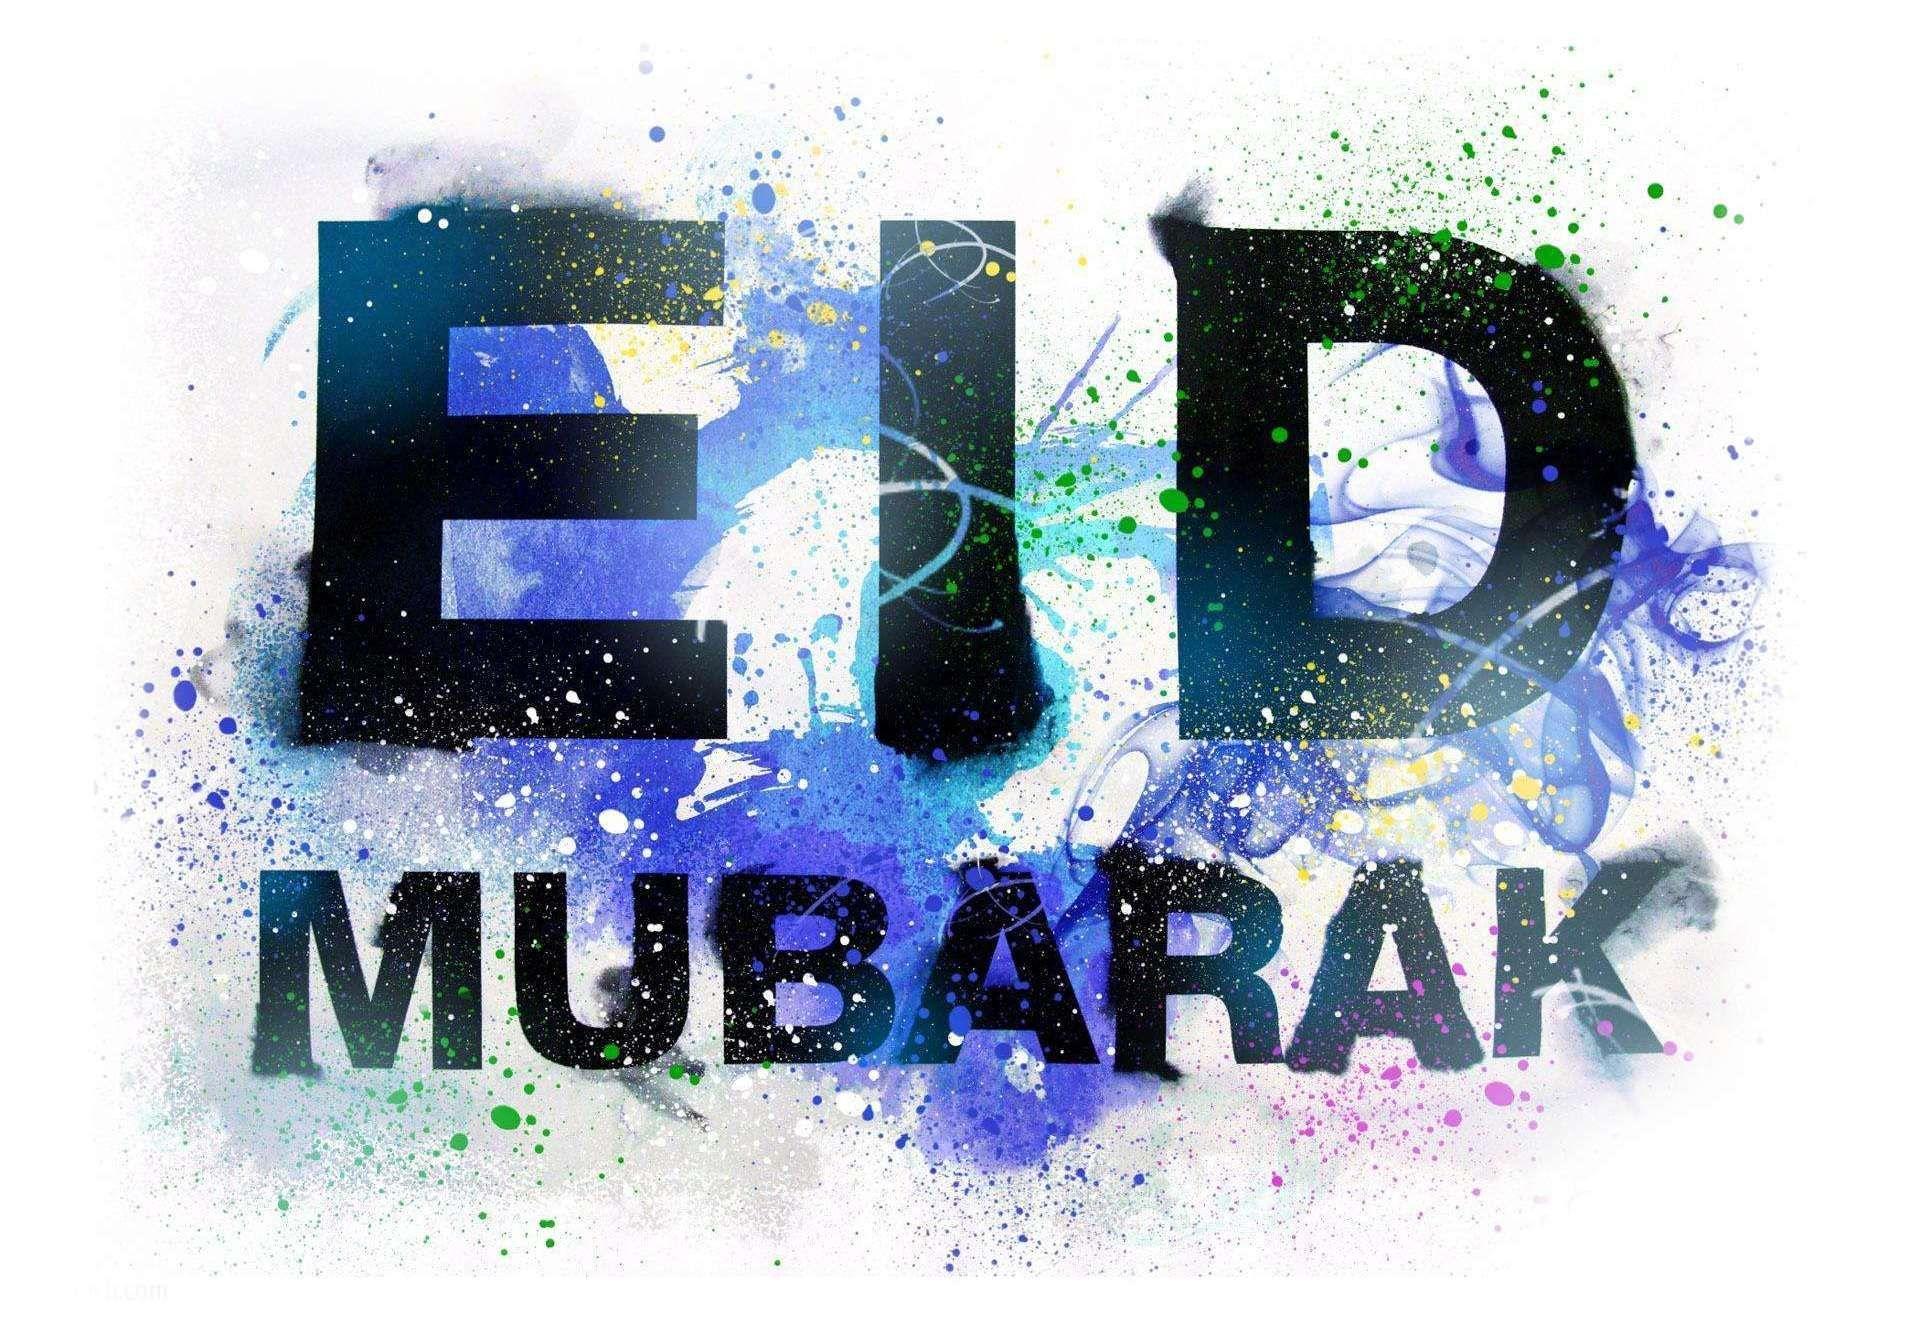 Hd wallpaper eid mubarak - Eid Mubarak 2014 Greetings Wallpapers Pc Free Download